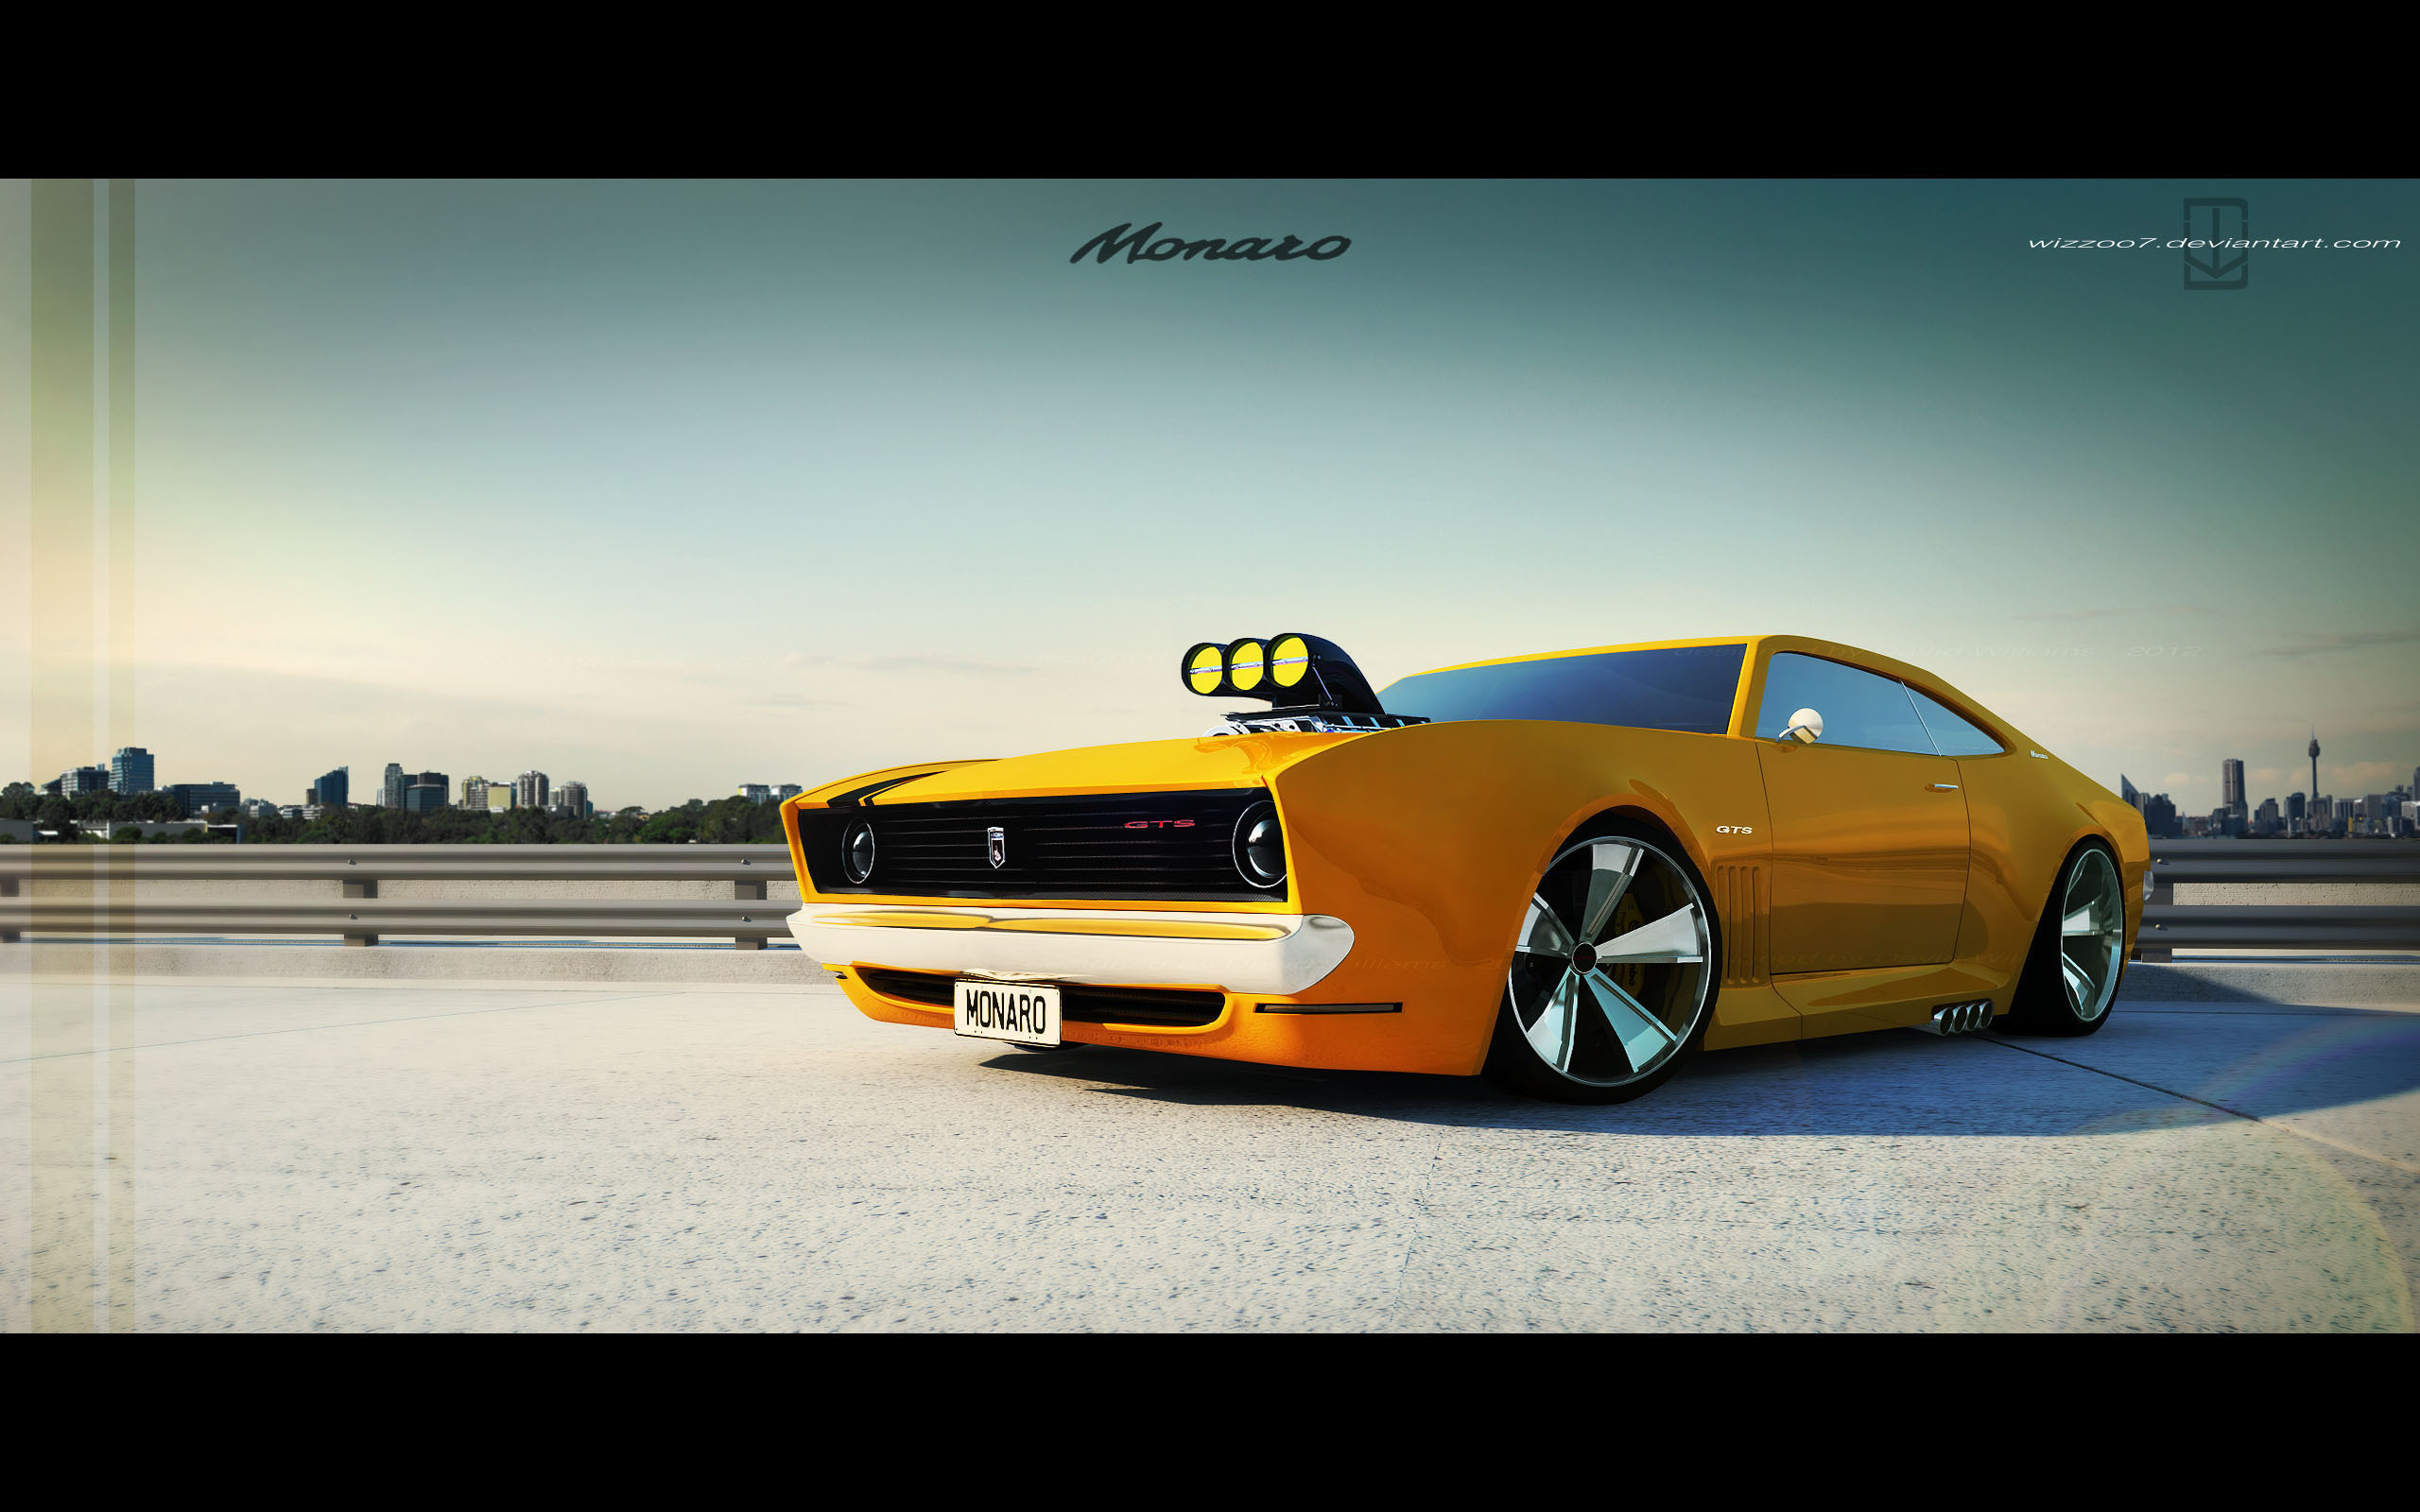 Hot Rod Tuning Muscle Cars Hd - HD Wallpaper